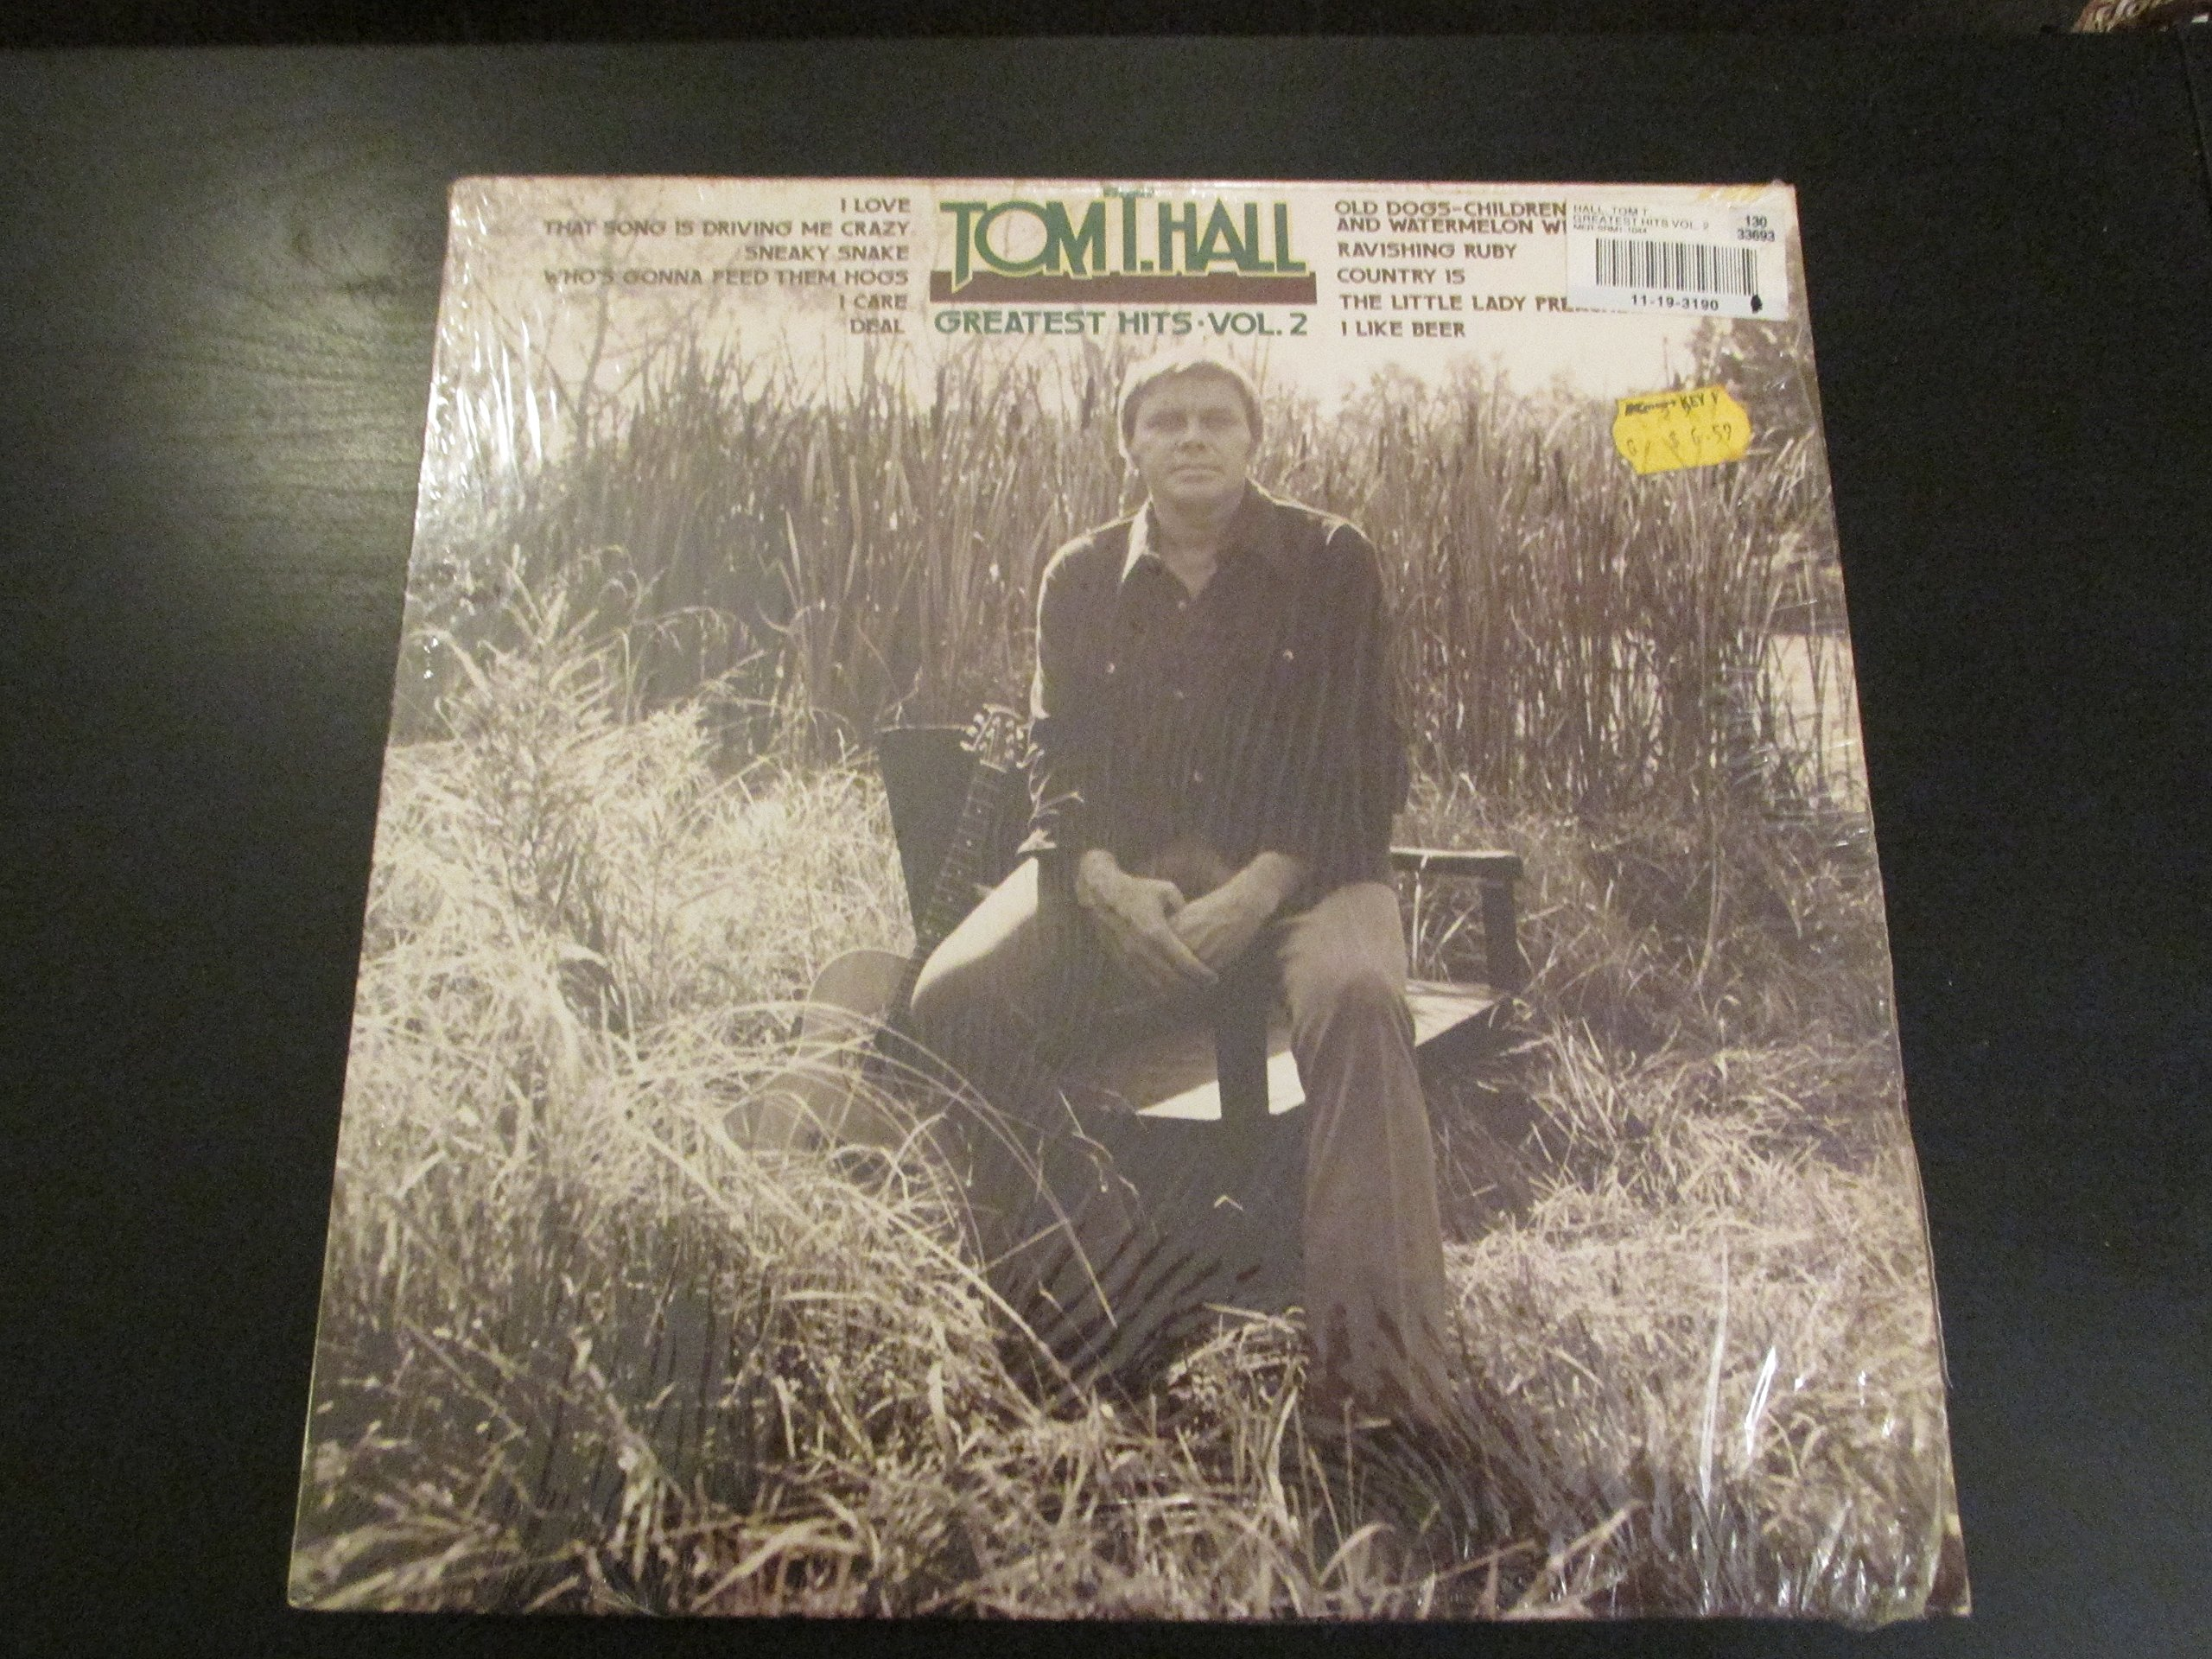 Tom T. Hall: Greatest Hits, Vol. 2